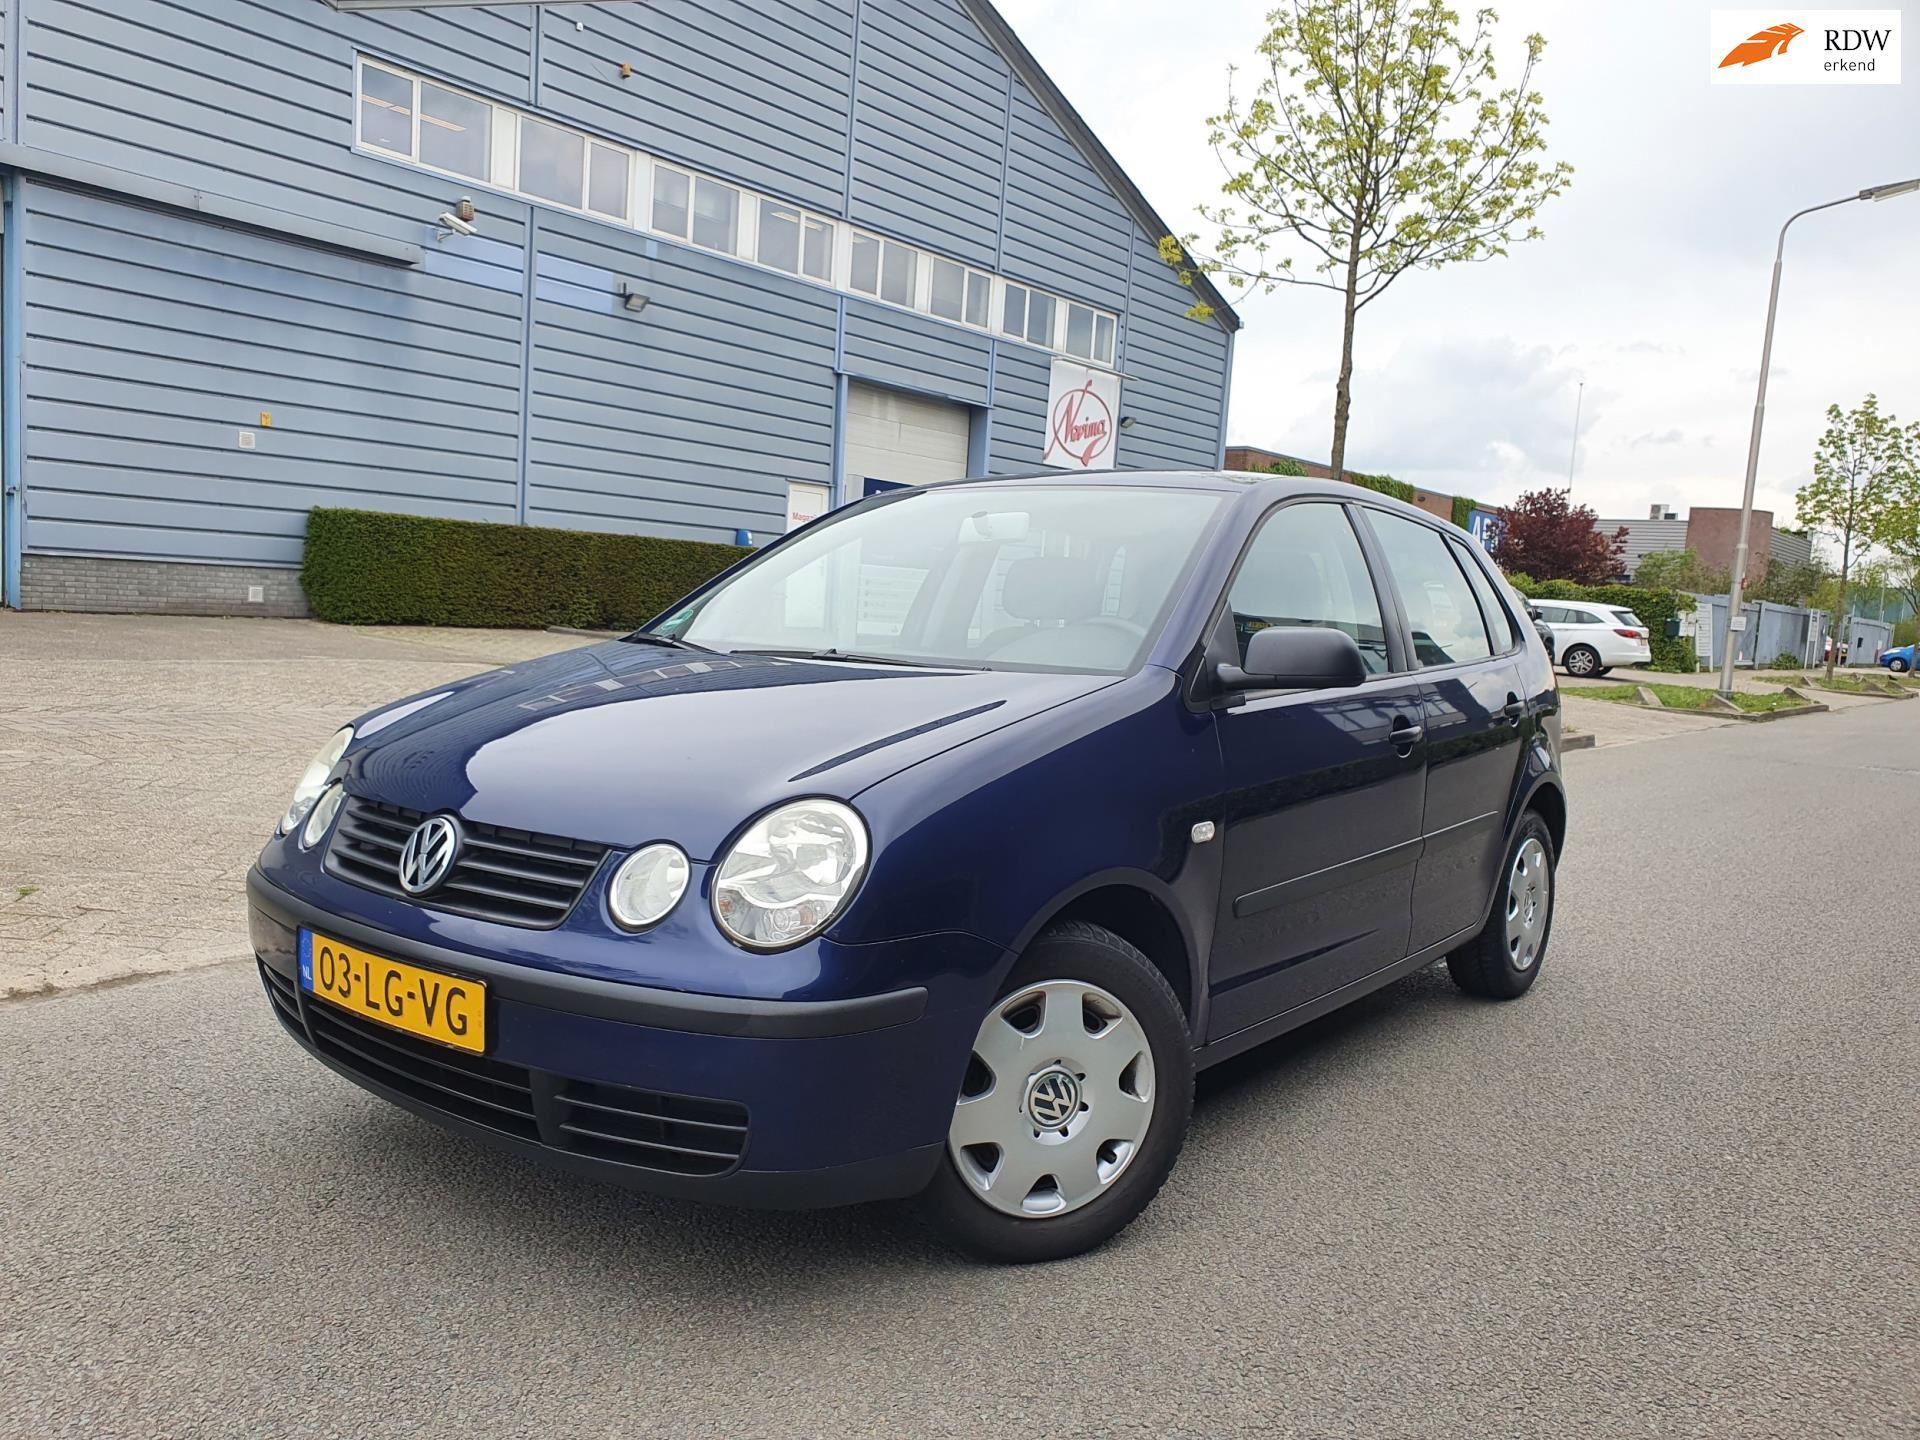 Volkswagen Polo occasion - Autohandel Direct